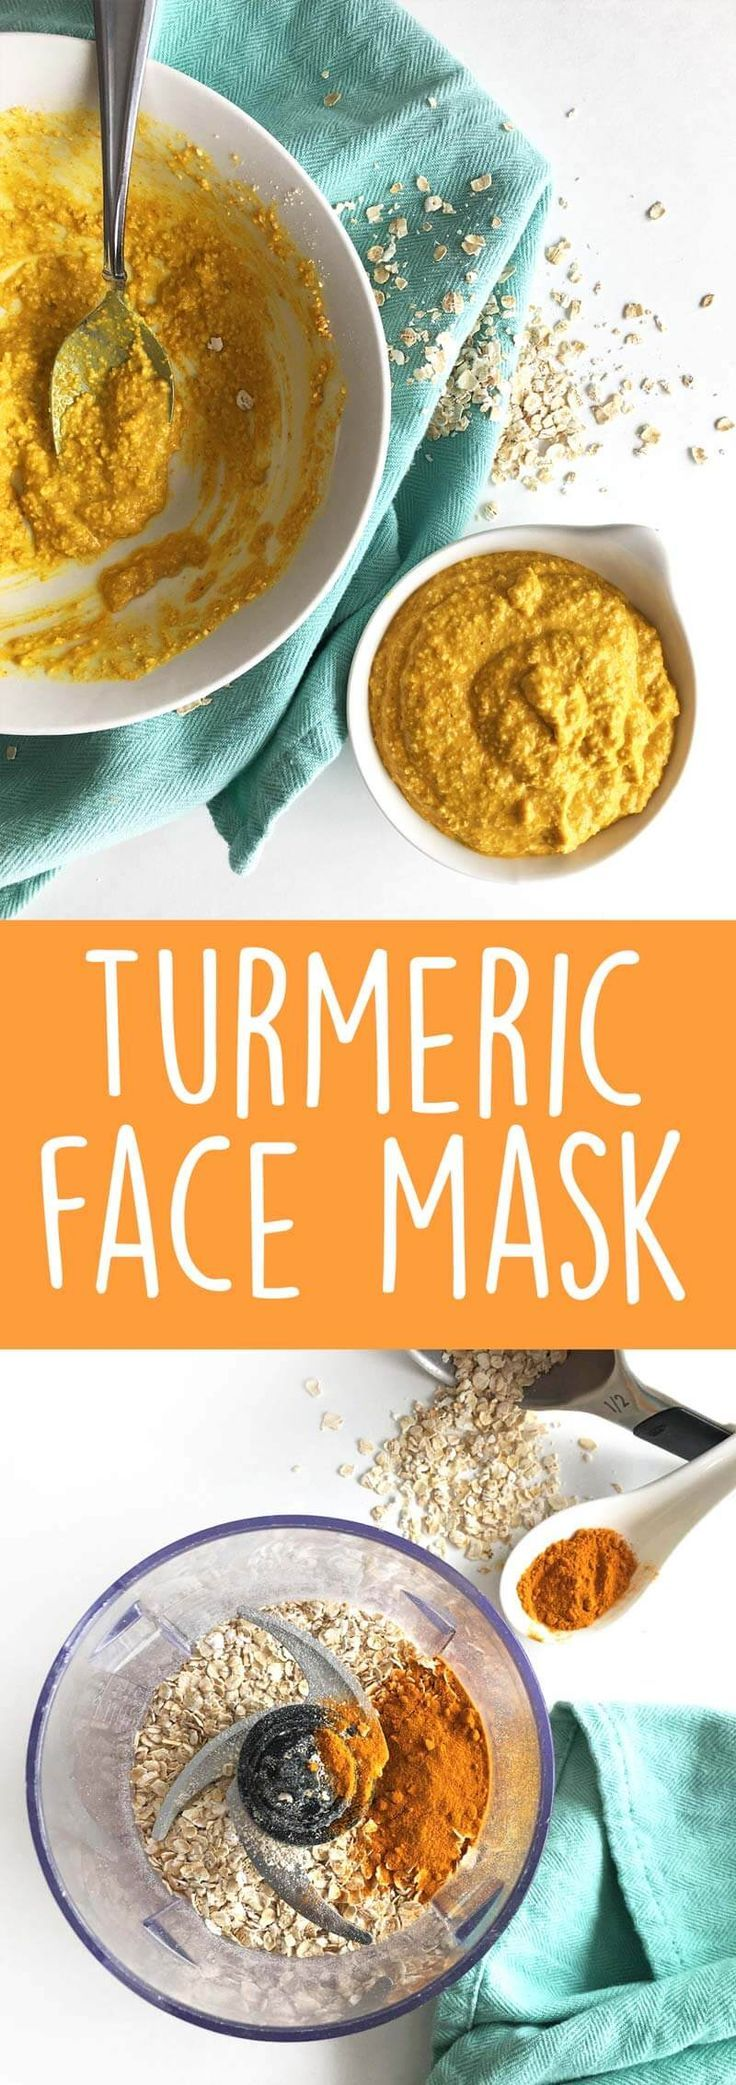 Oatmeal and turmeric face mask recipe do it yourself today oatmeal and turmeric face mask recipe do it yourself today pinterest turmeric face mask homemade face masks and dark spots solutioingenieria Gallery